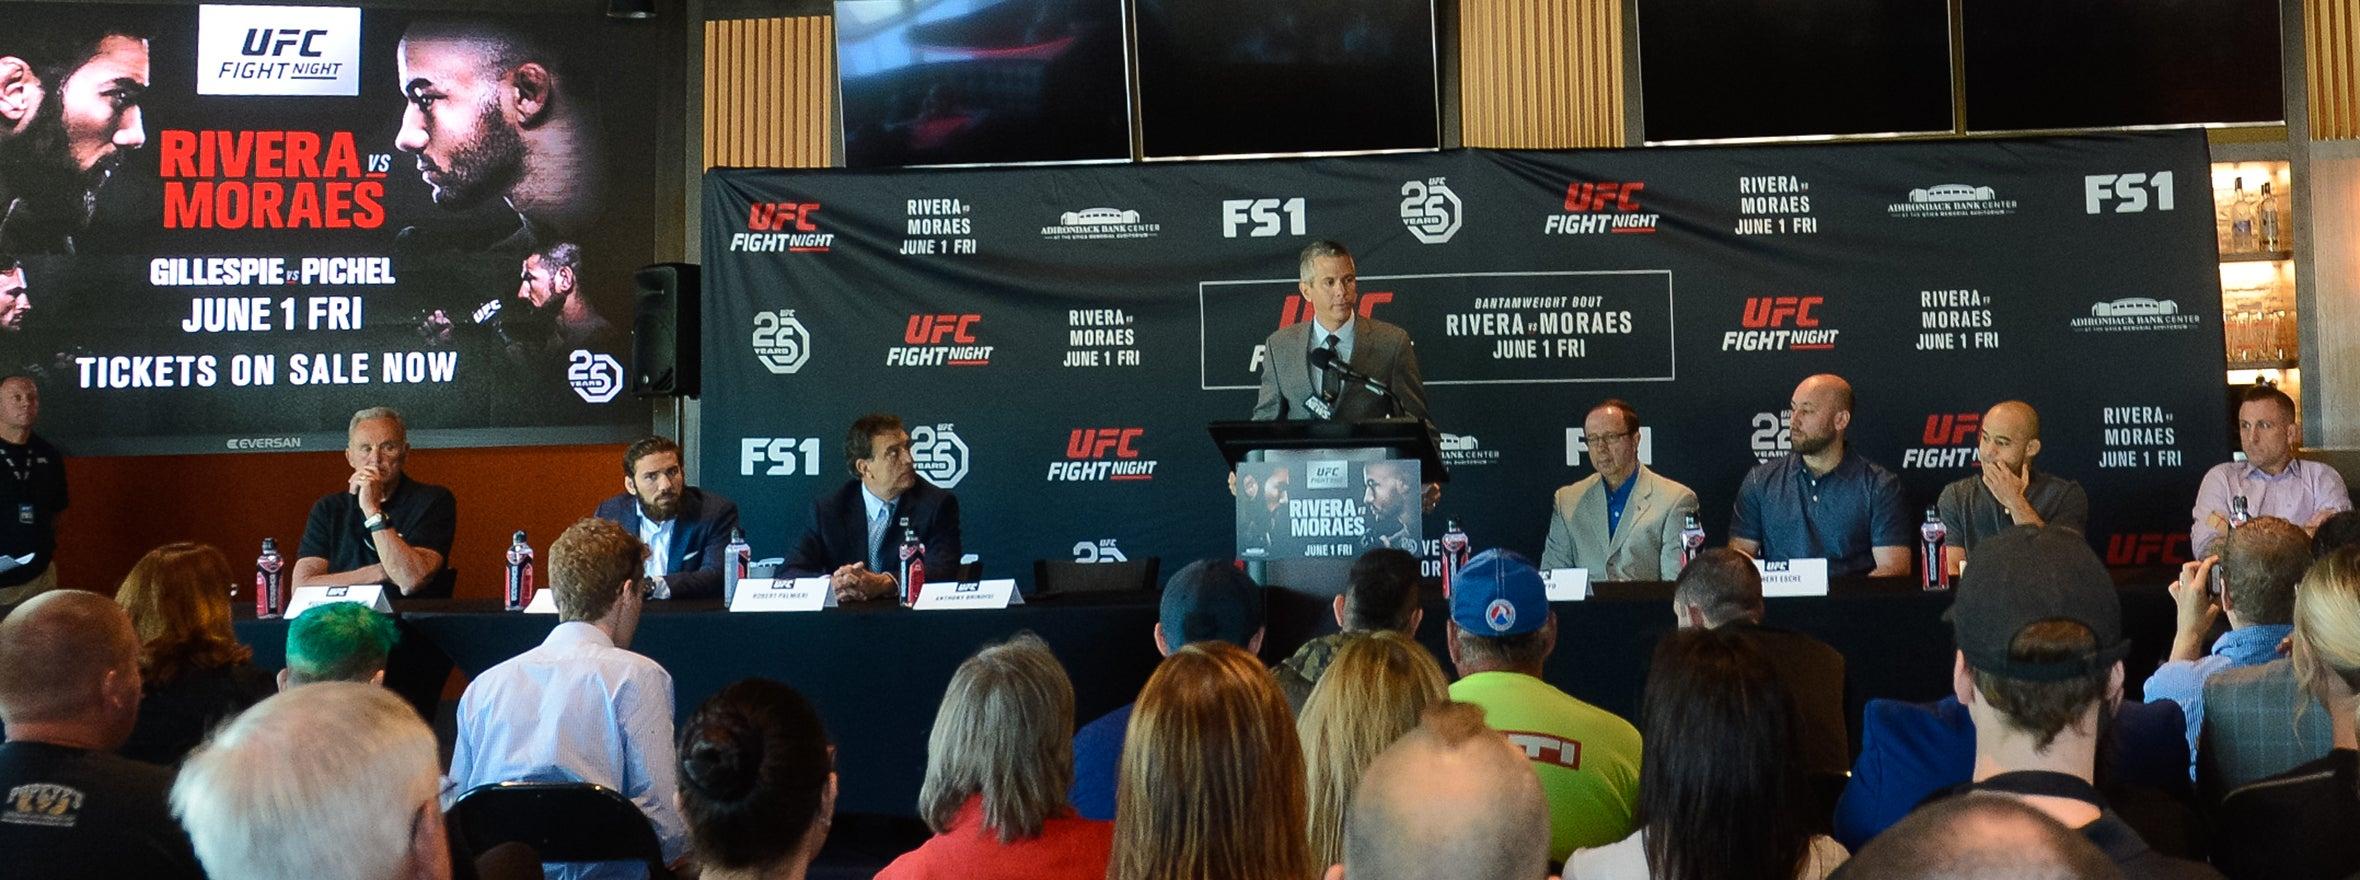 UFC NEWS CONFERENCE KICKS OFF FIGHT WEEK